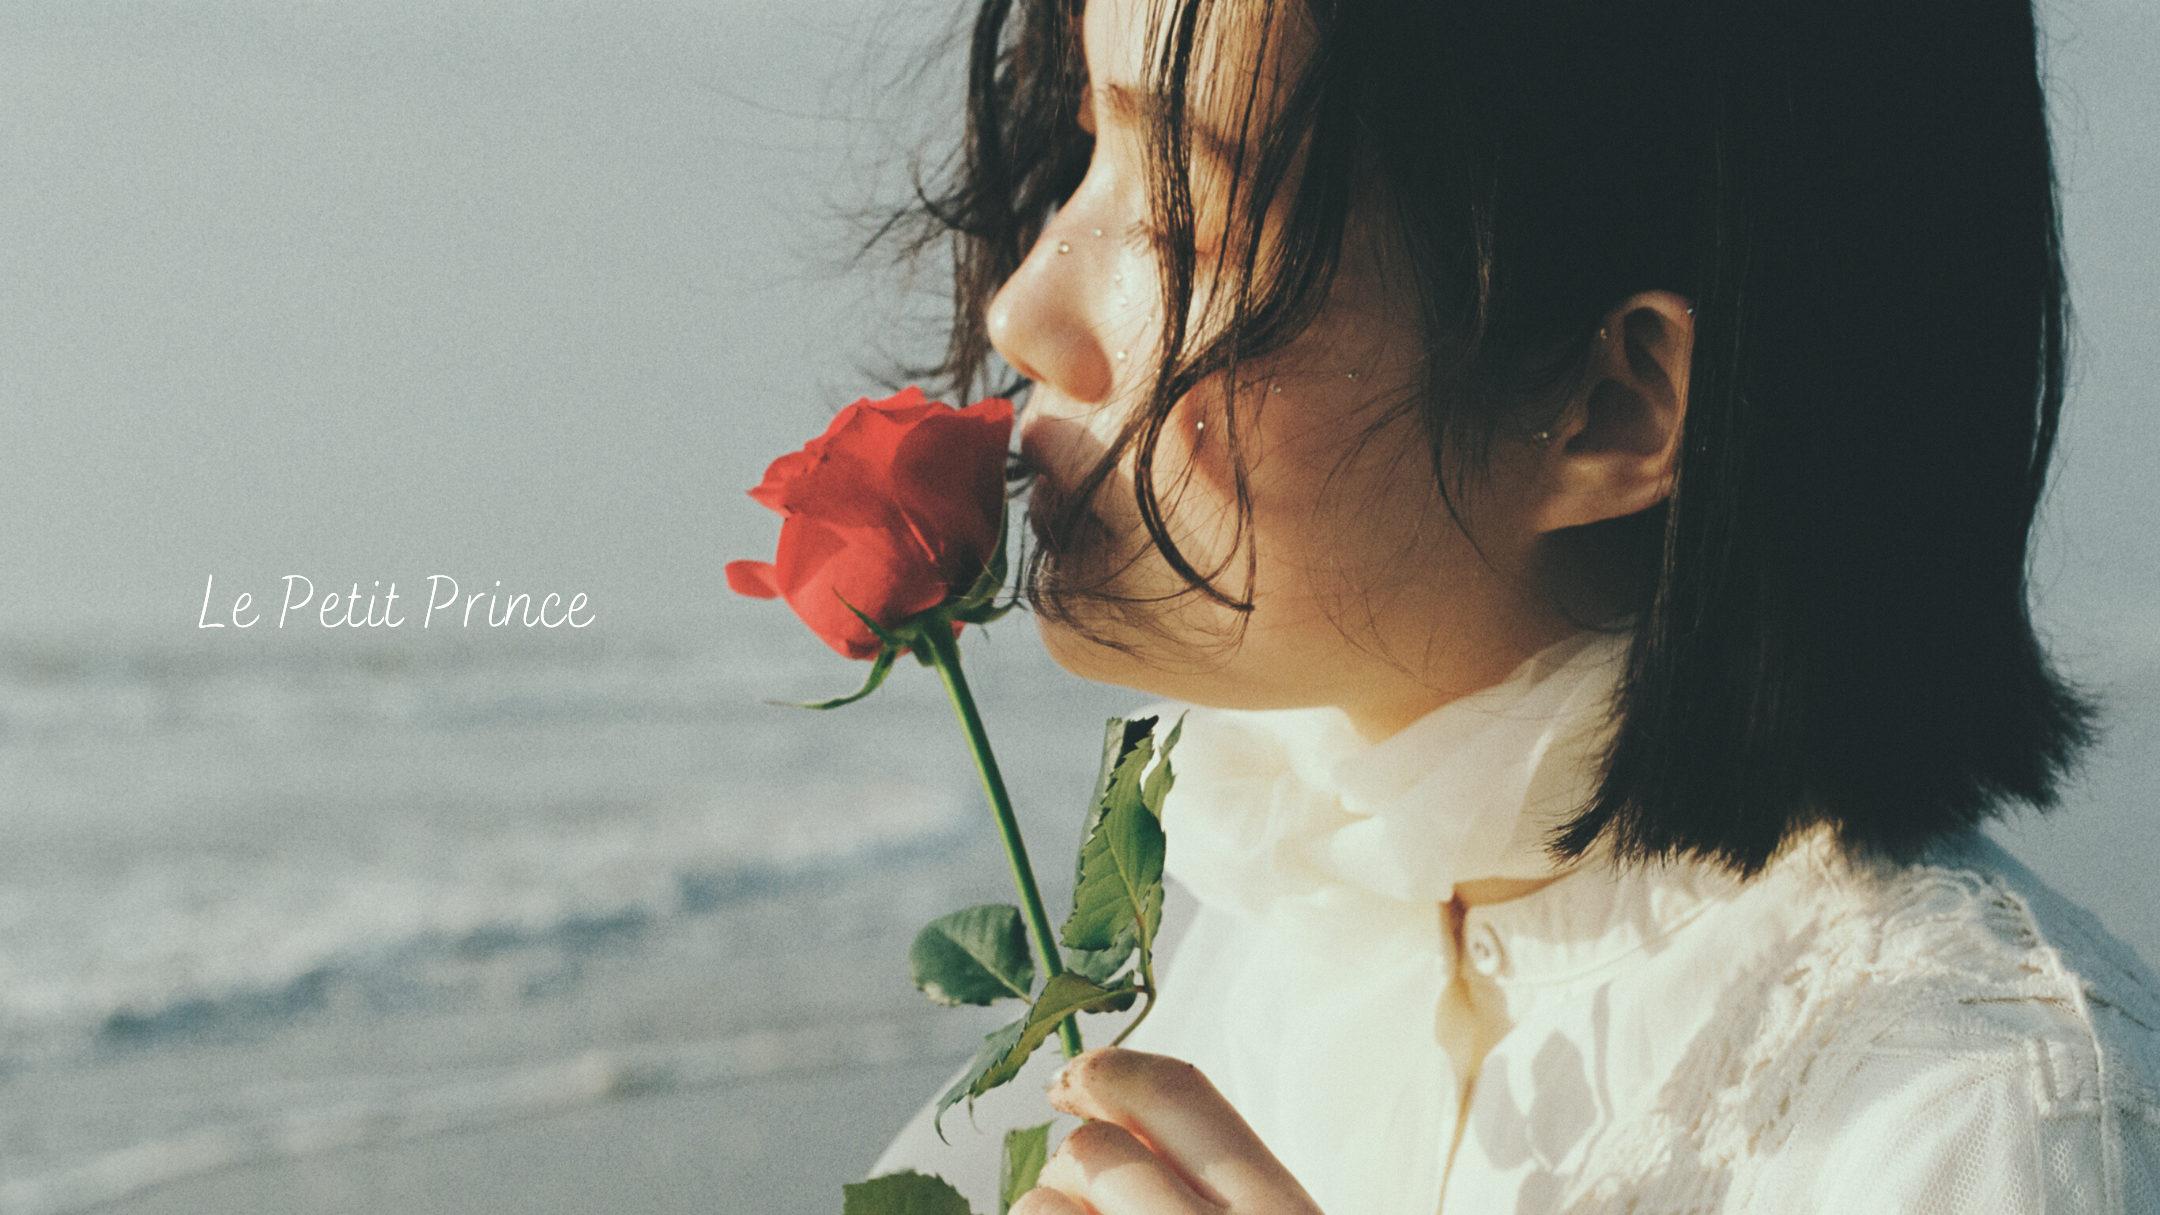 WEB写真集 vol.2 - aika「星の王子さまが描く、出会いと絆の大切さ」